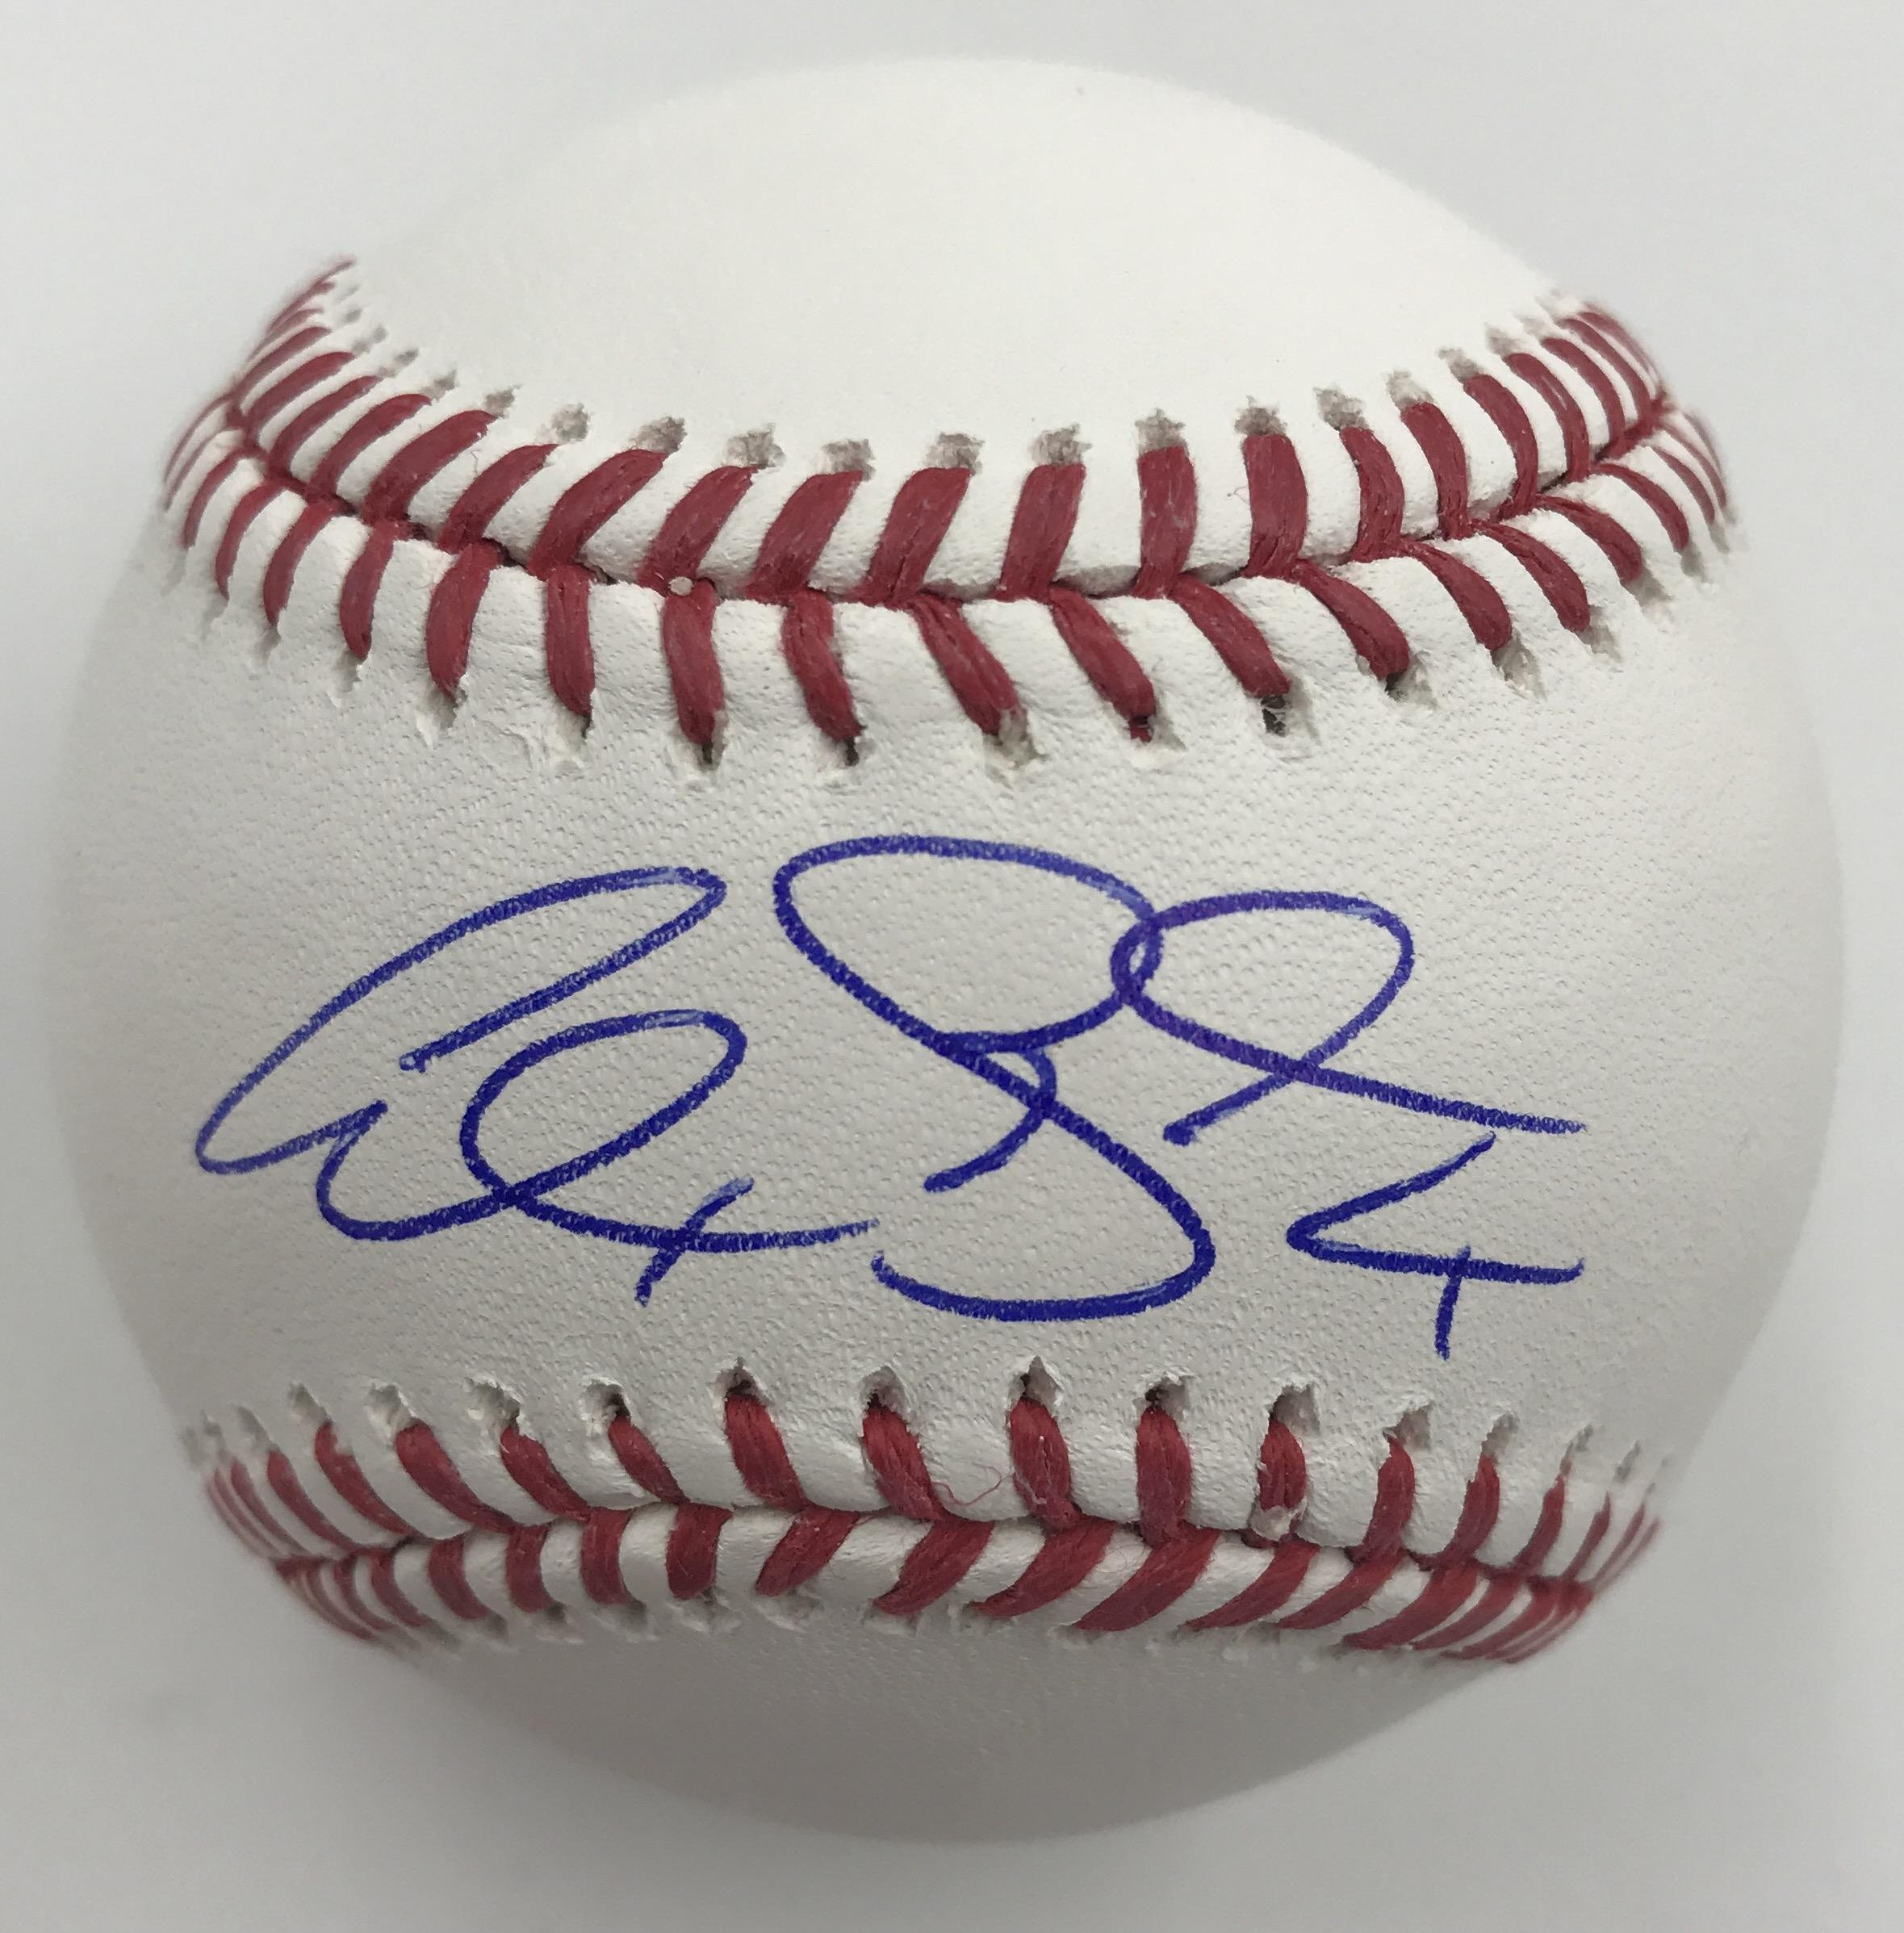 Alex Gordon Autographed Baseball Autographed Baseballs